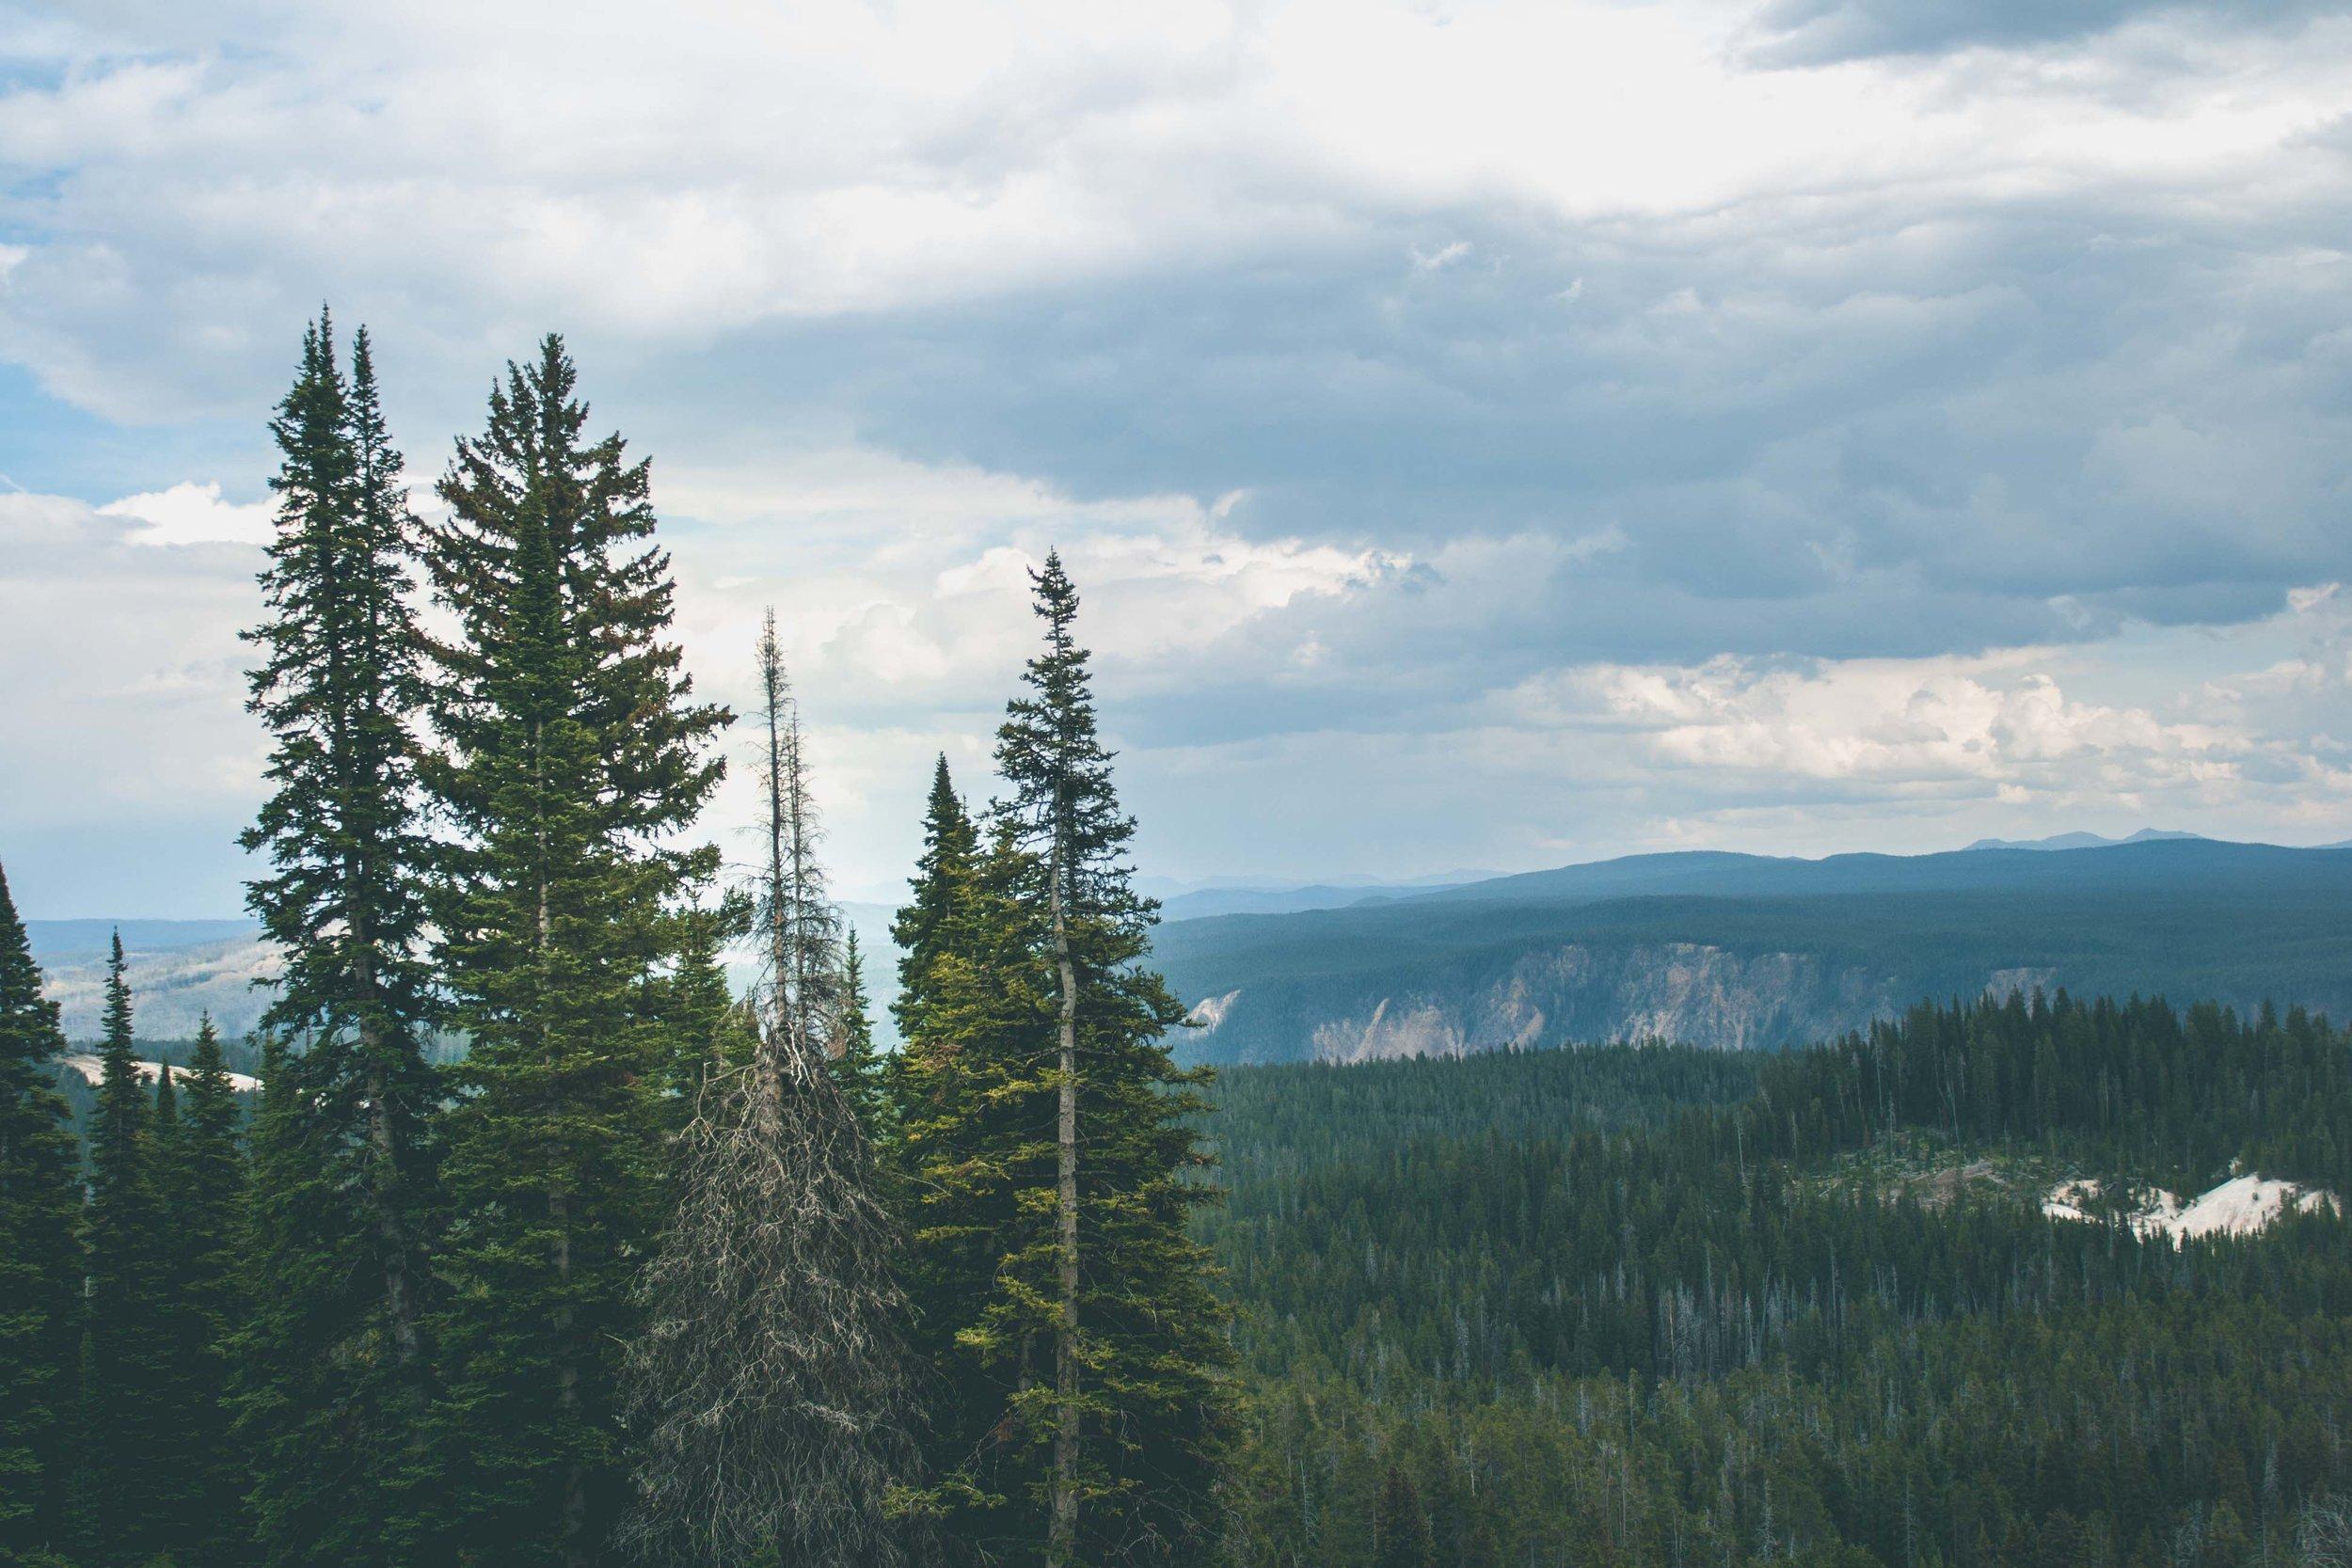 Yellowstone National Park, Wyoming. August 2017